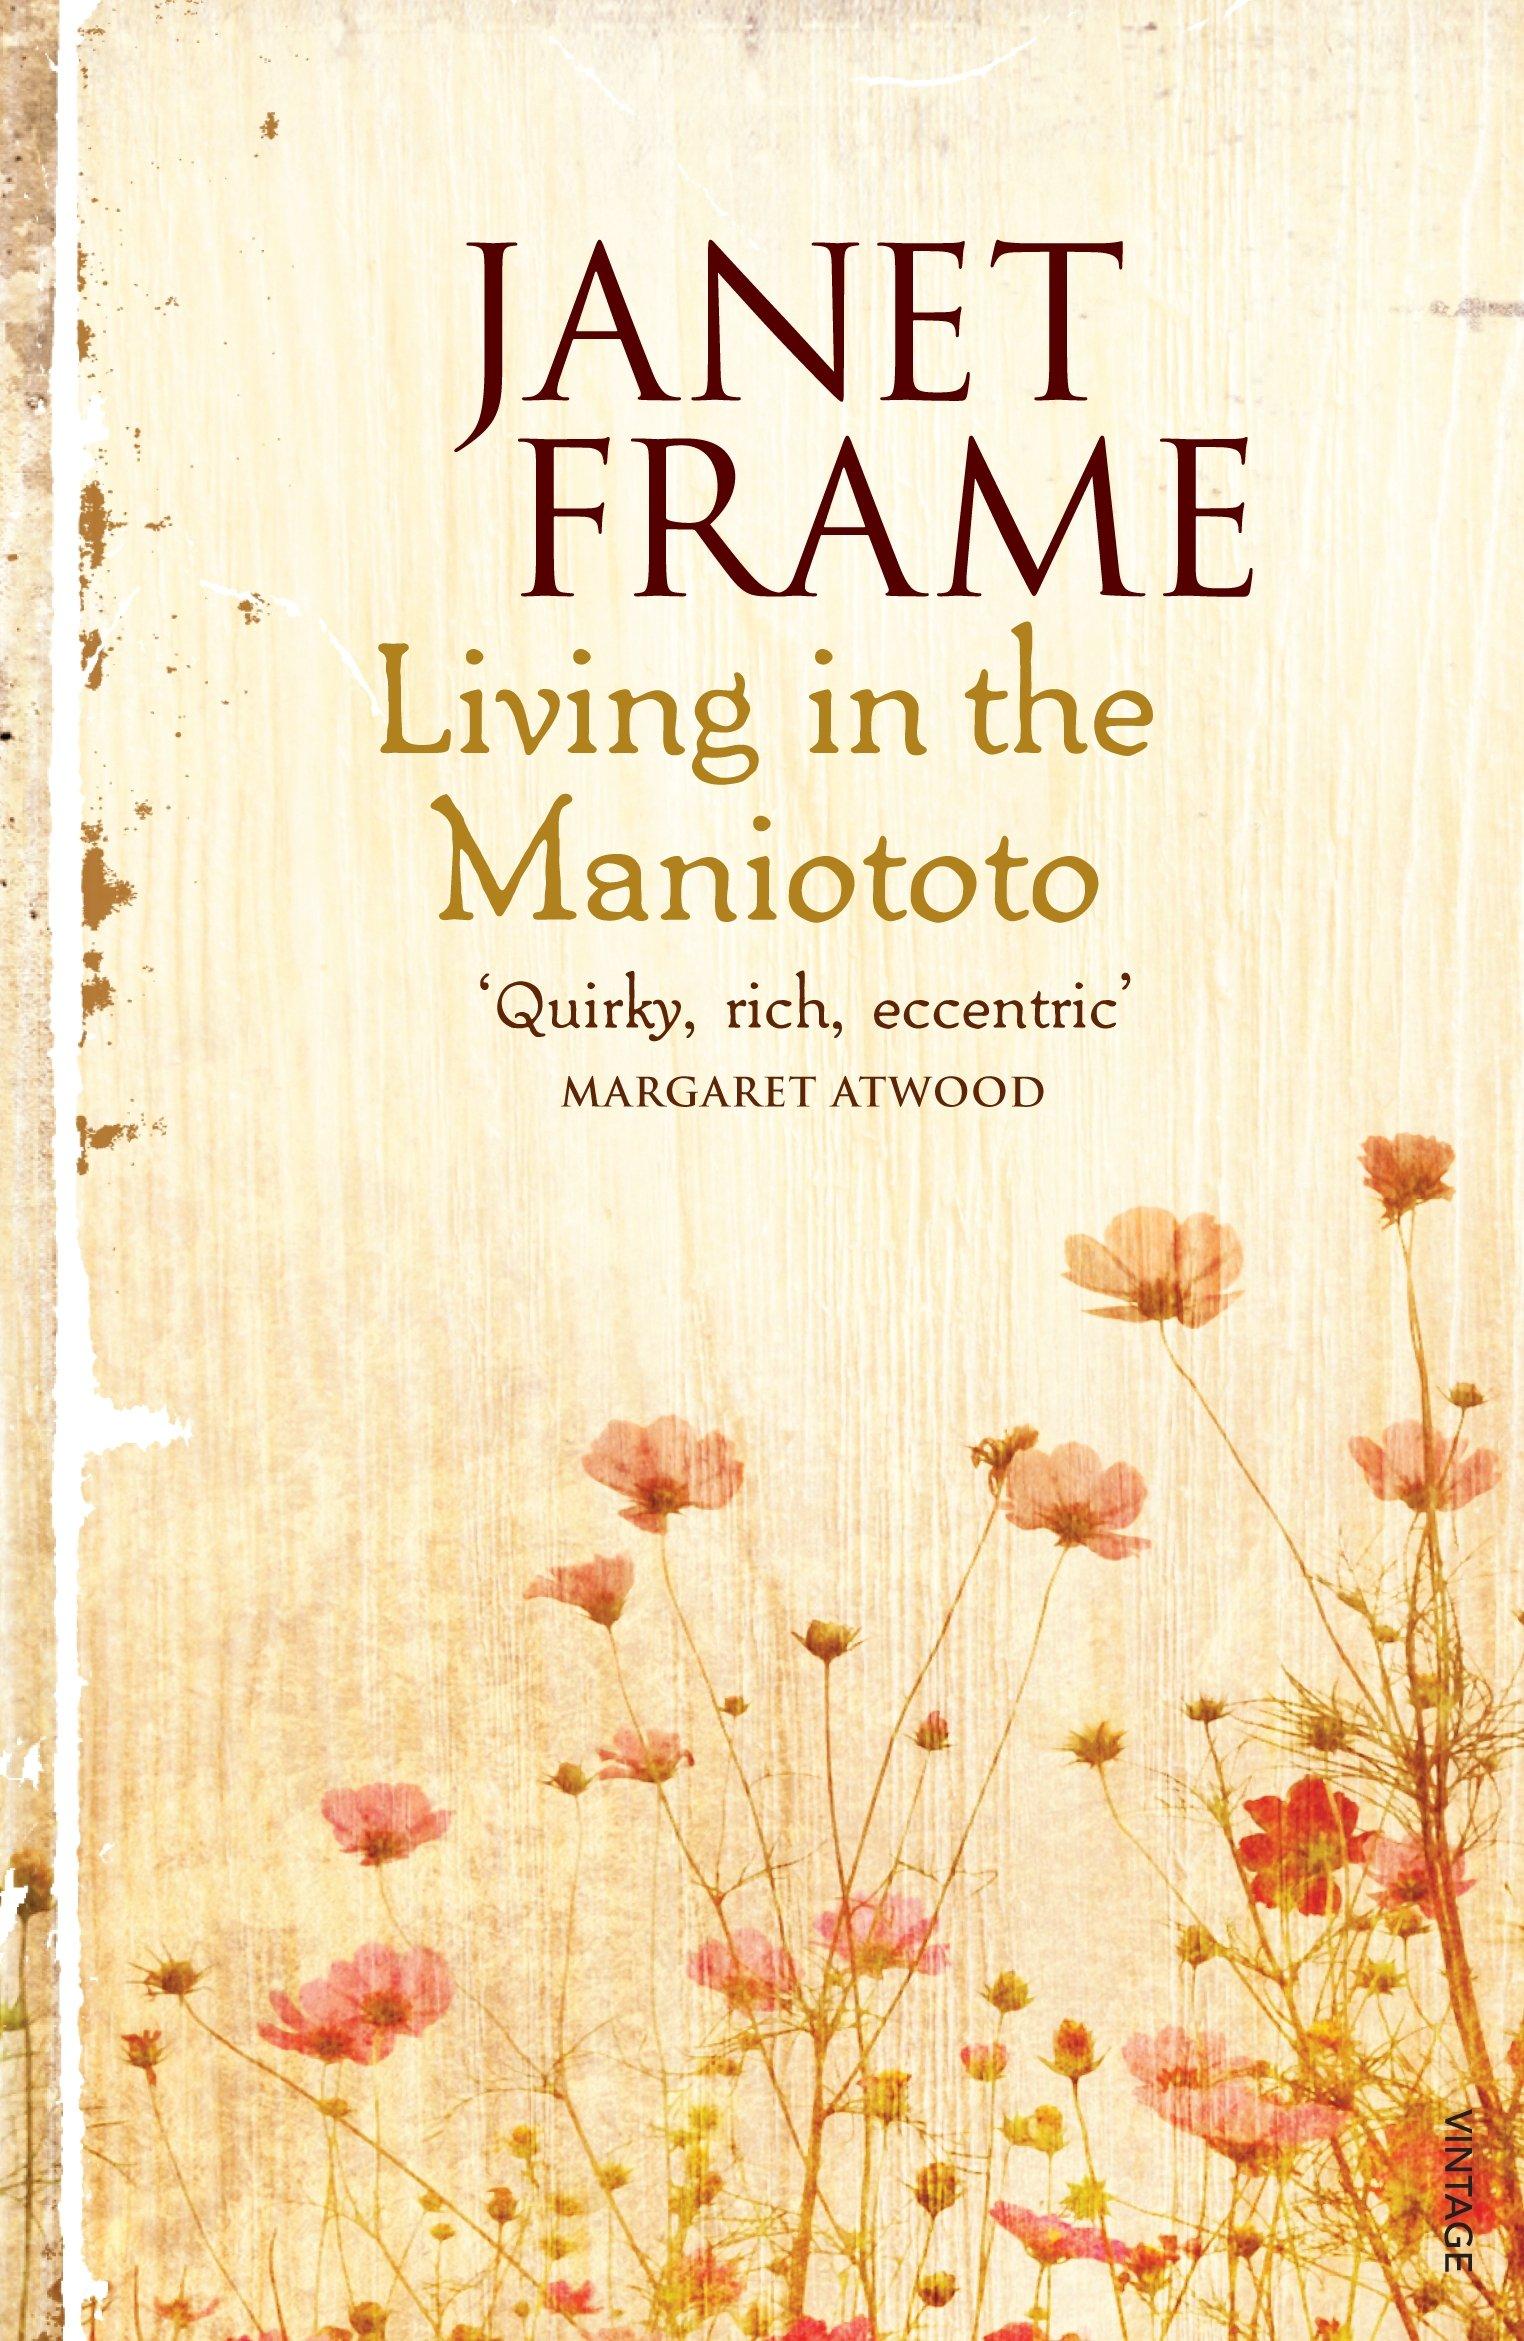 Vintage Book Cover Frame ~ Namaste inspirational upcycled vintage book page art box frame or